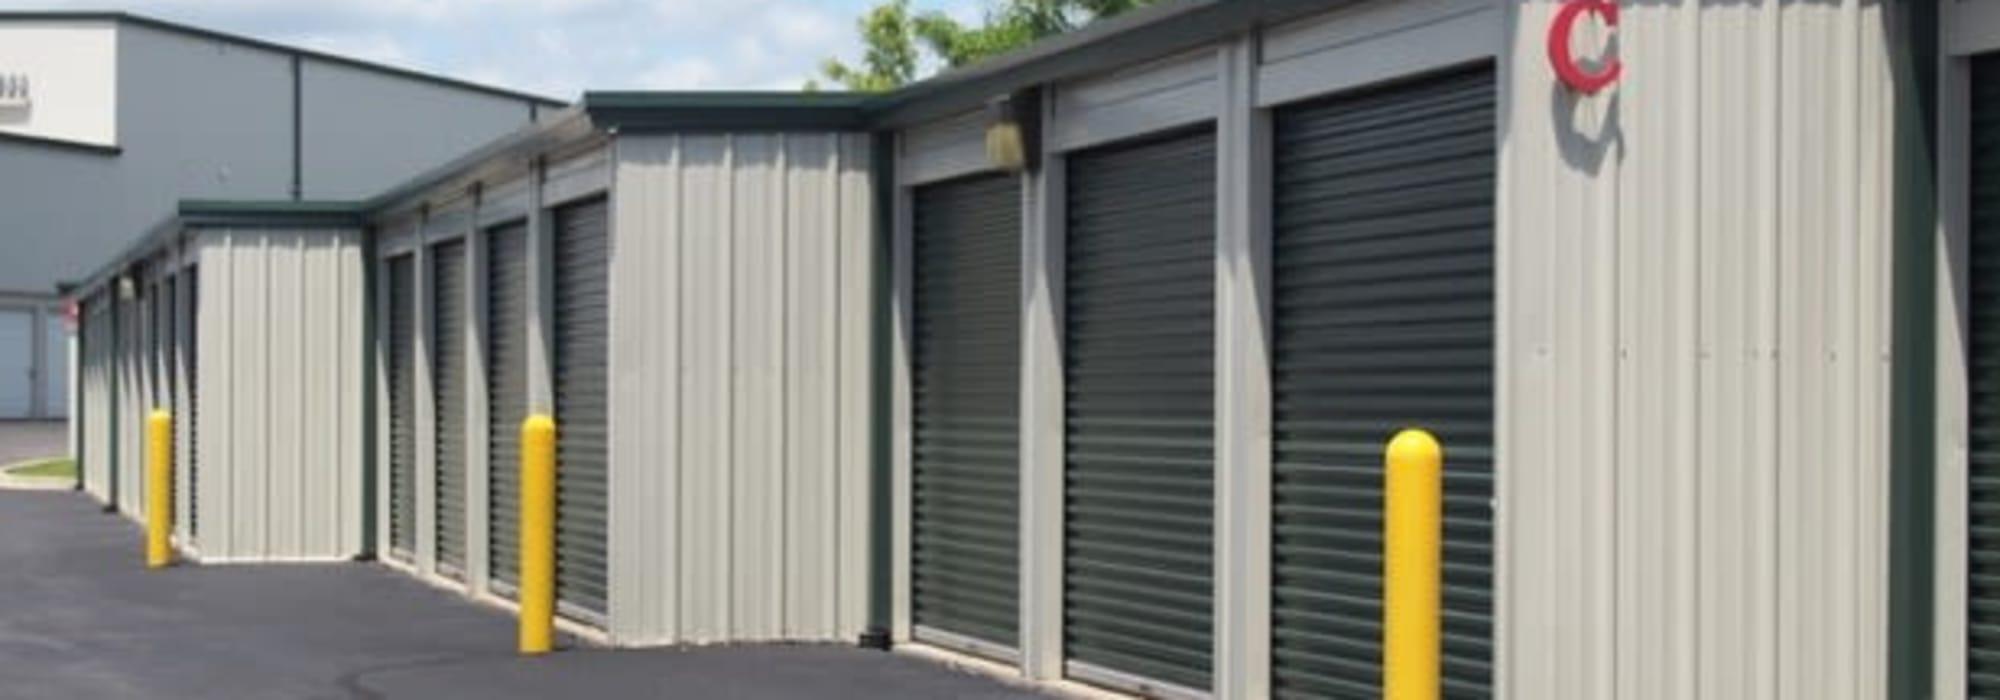 Self storage from Michigan Storage Centers in Farmington Hills, Michigan